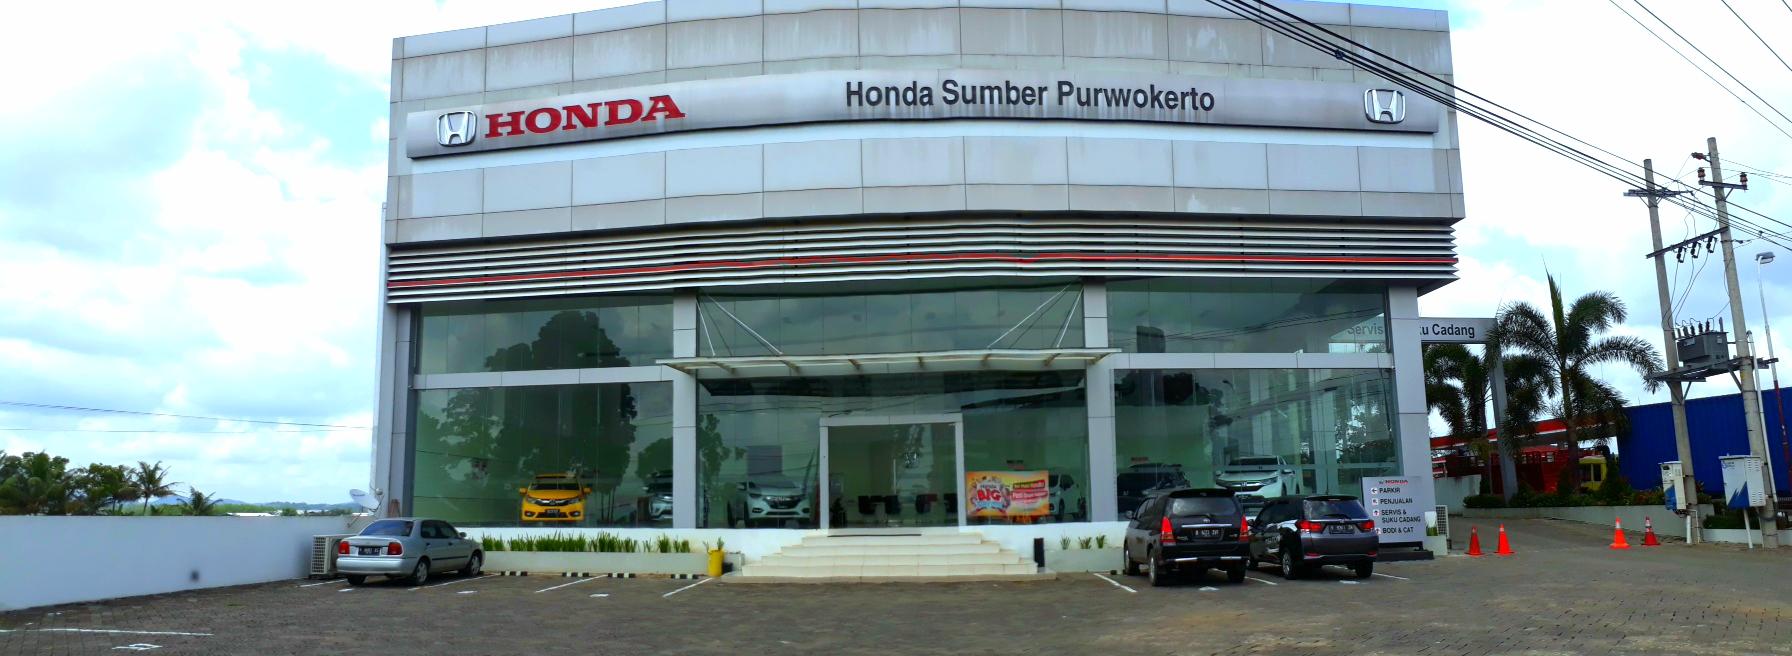 Dealer Honda Sumber Purwokerto